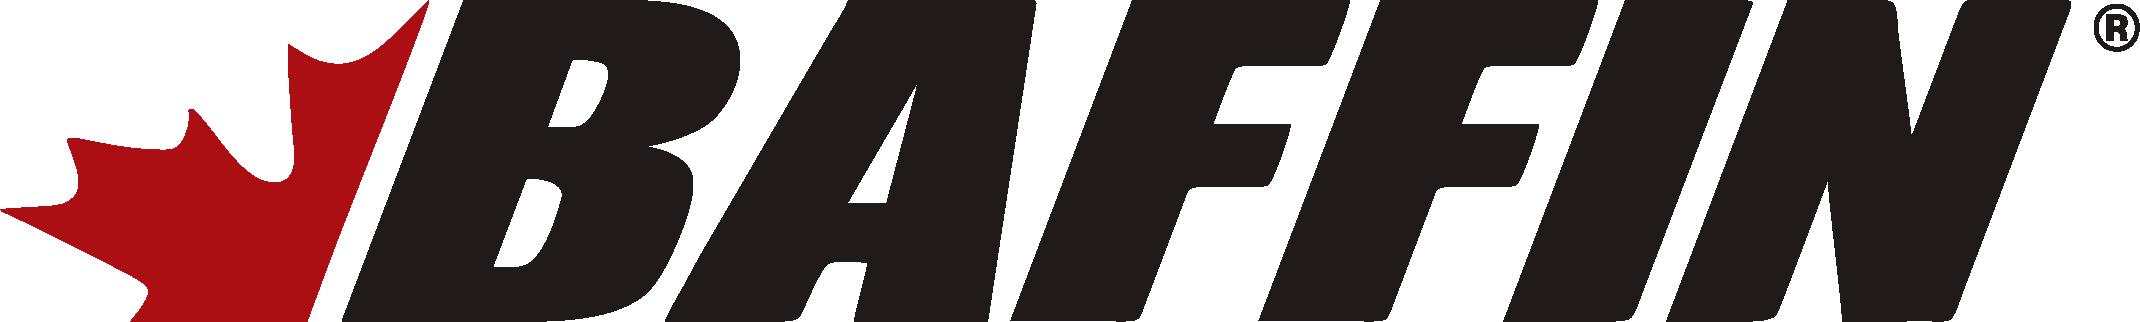 Baffin_logo_DIGITAL-standard